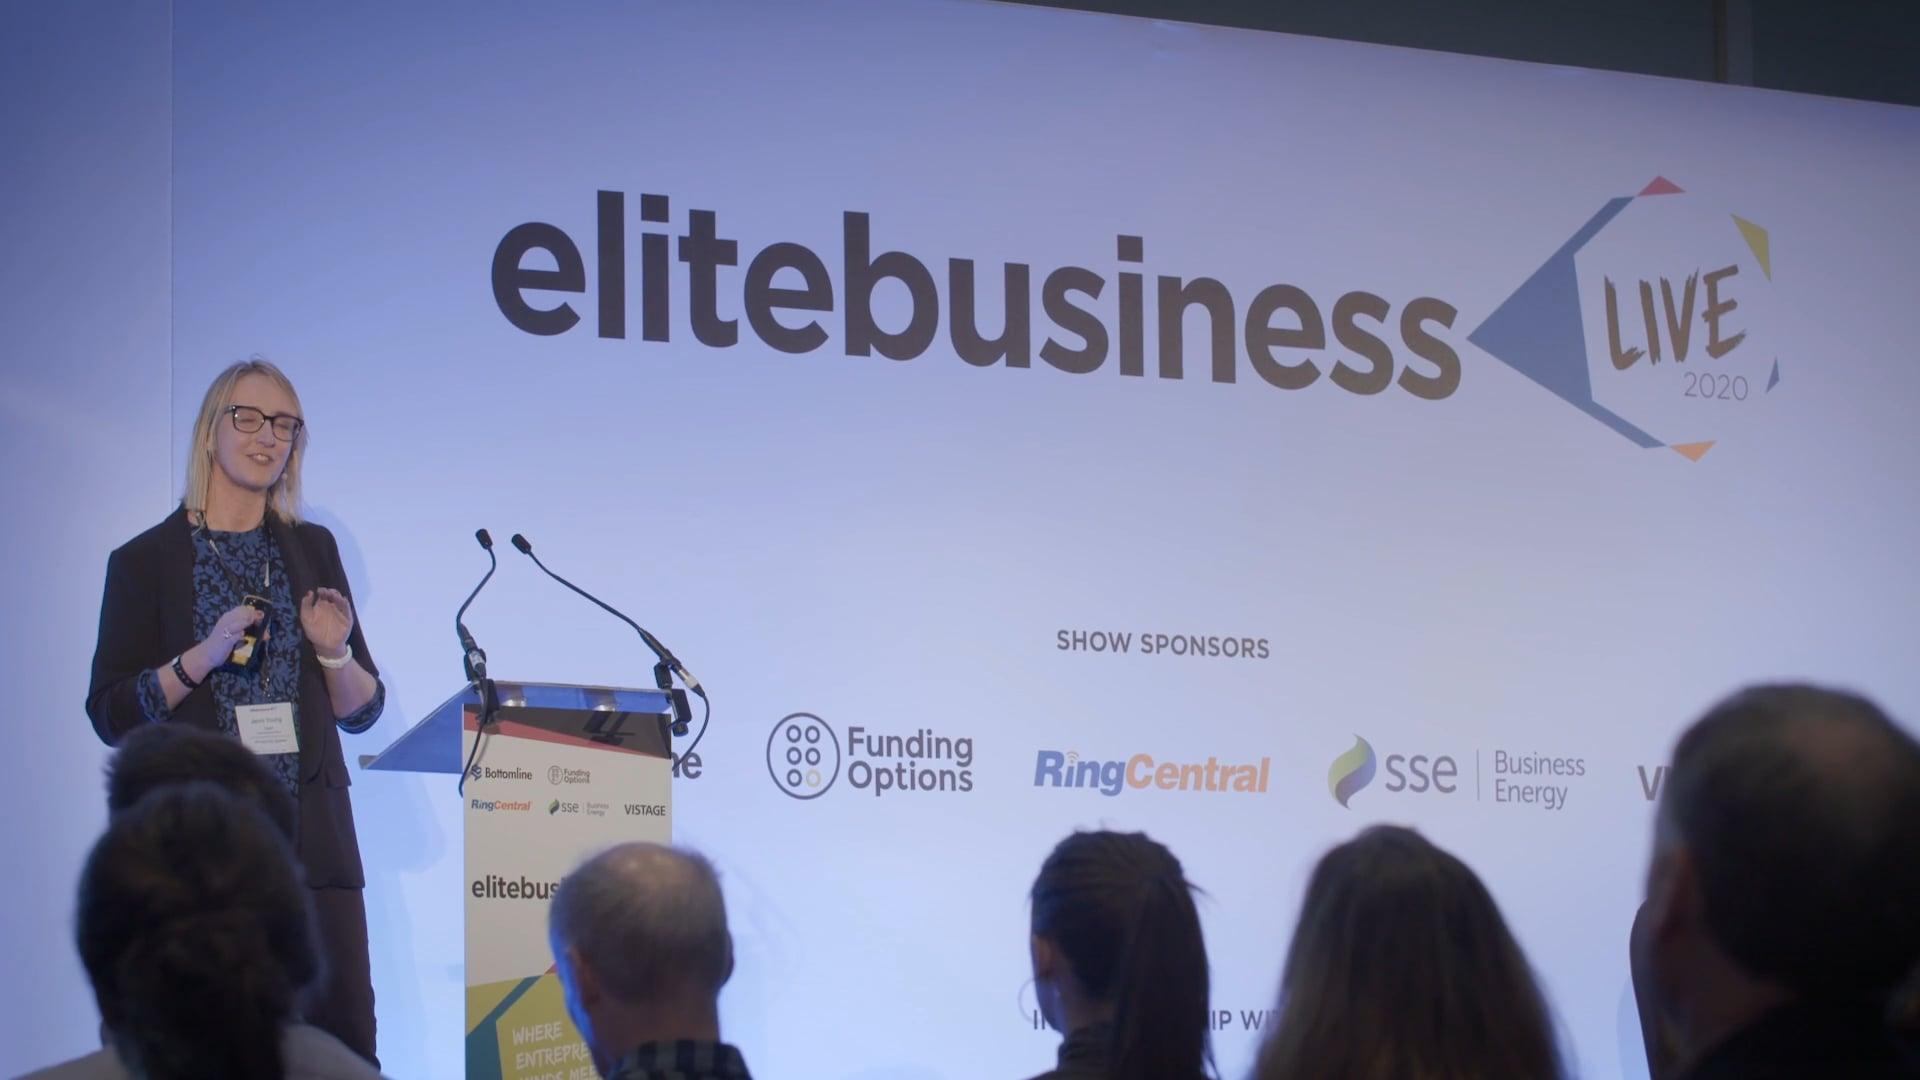 Elite Business Live 2020